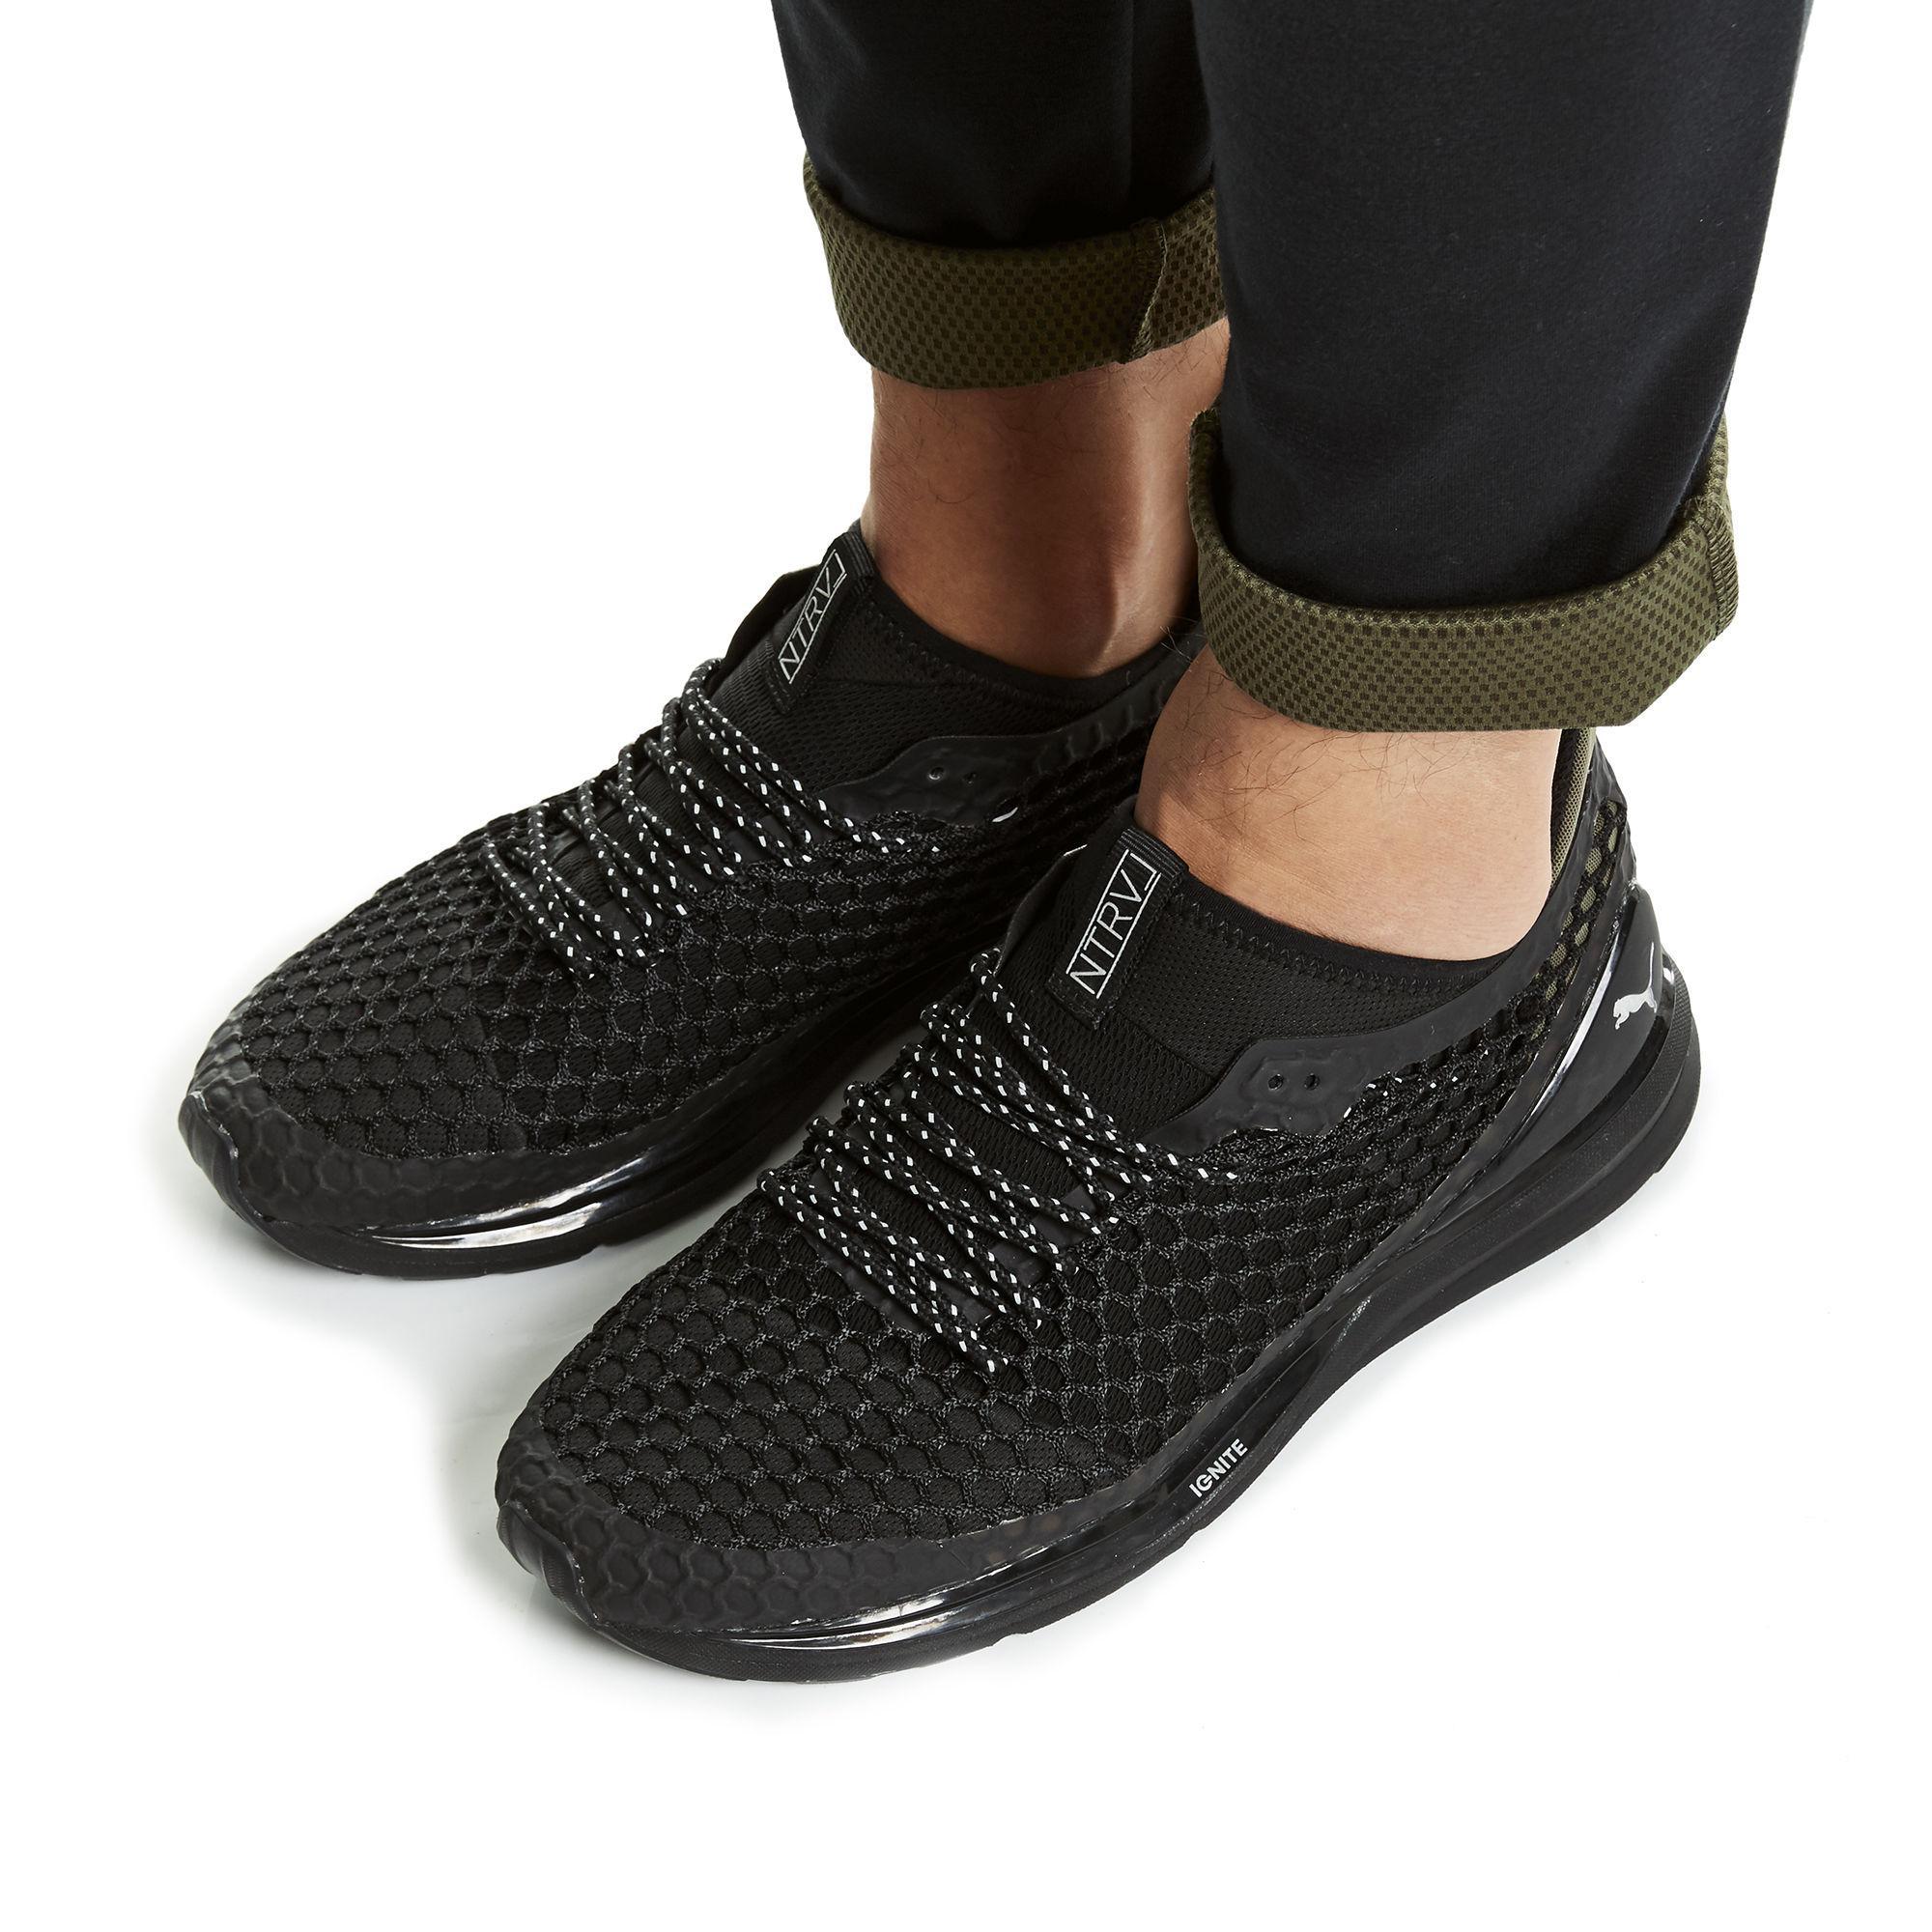 online retailer cd26b 7fe75 PUMA Black X Staple Ignite Limitless Netfit Training Shoes for men